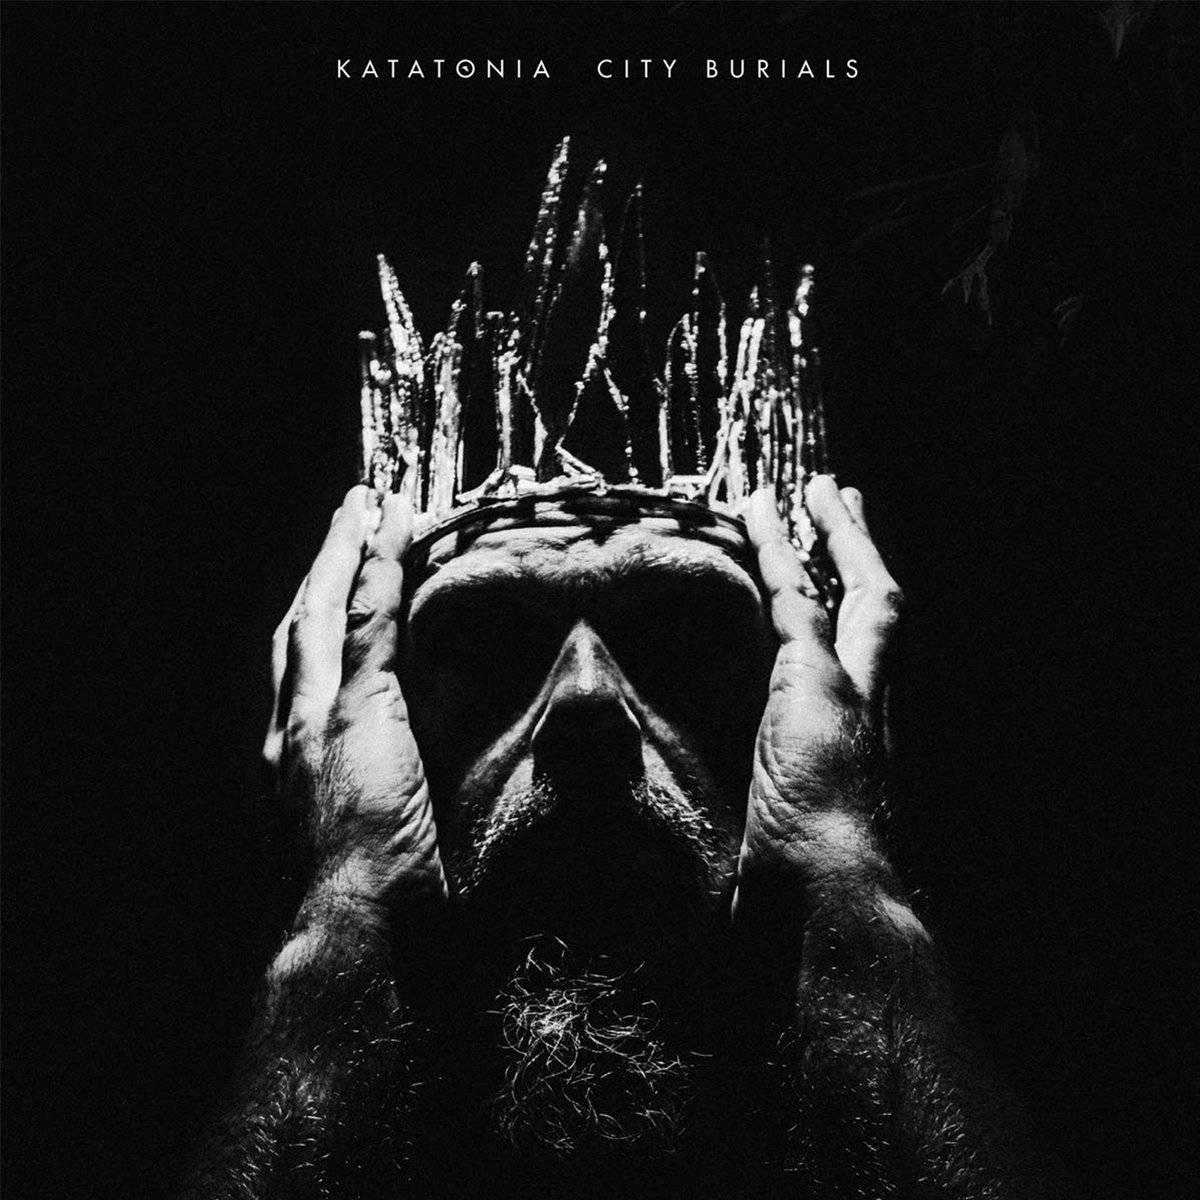 "My #Bestof2020 music list for #MajorDistribution #HeavyMetal albums is as follows: 5) DEFTONES ""Ohms"" (Reprise) 4) KILLER BE KILLED ""Reluctant Hero"" (Nuclear Blast) 3) FIVE FINGER DEATH PUNCH ""F8"" (Better Noise) 2) KATATONIA ""City Burials"" (Peaceville) #MetalLives #MusicIsLife 🤘"